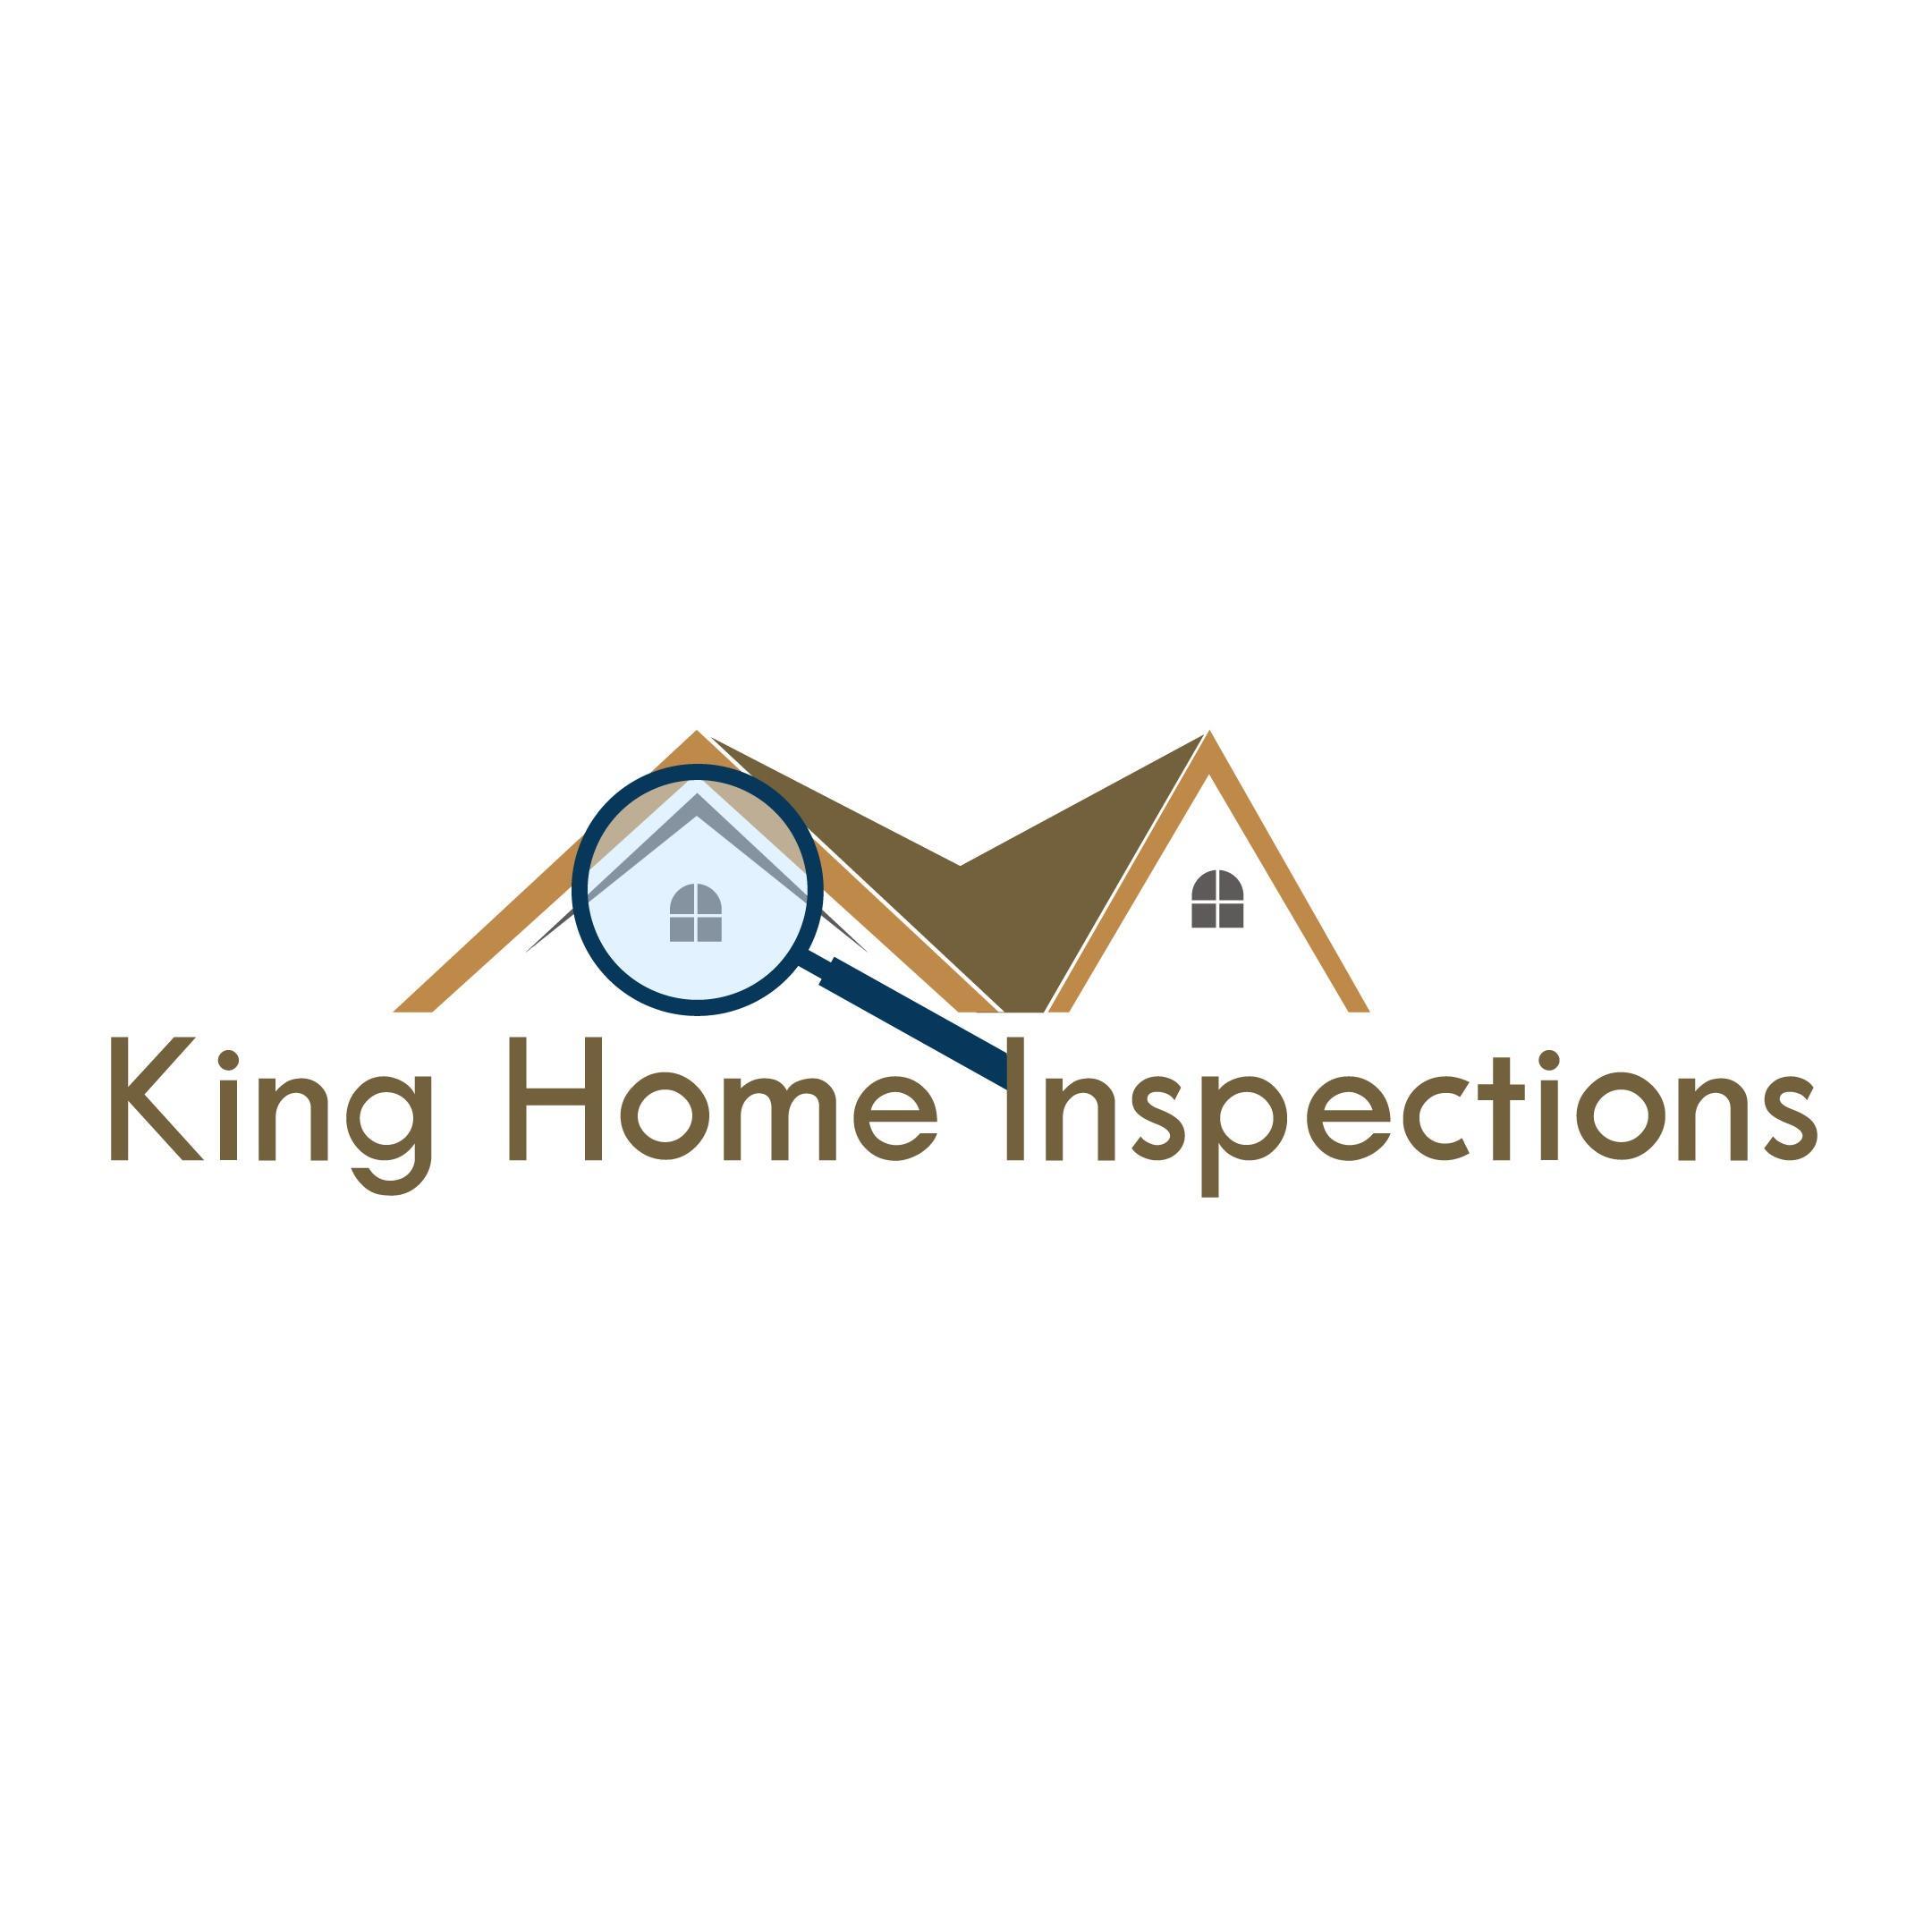 King Home Inspections - Jackson, KY 41339 - (606)693-0238 | ShowMeLocal.com